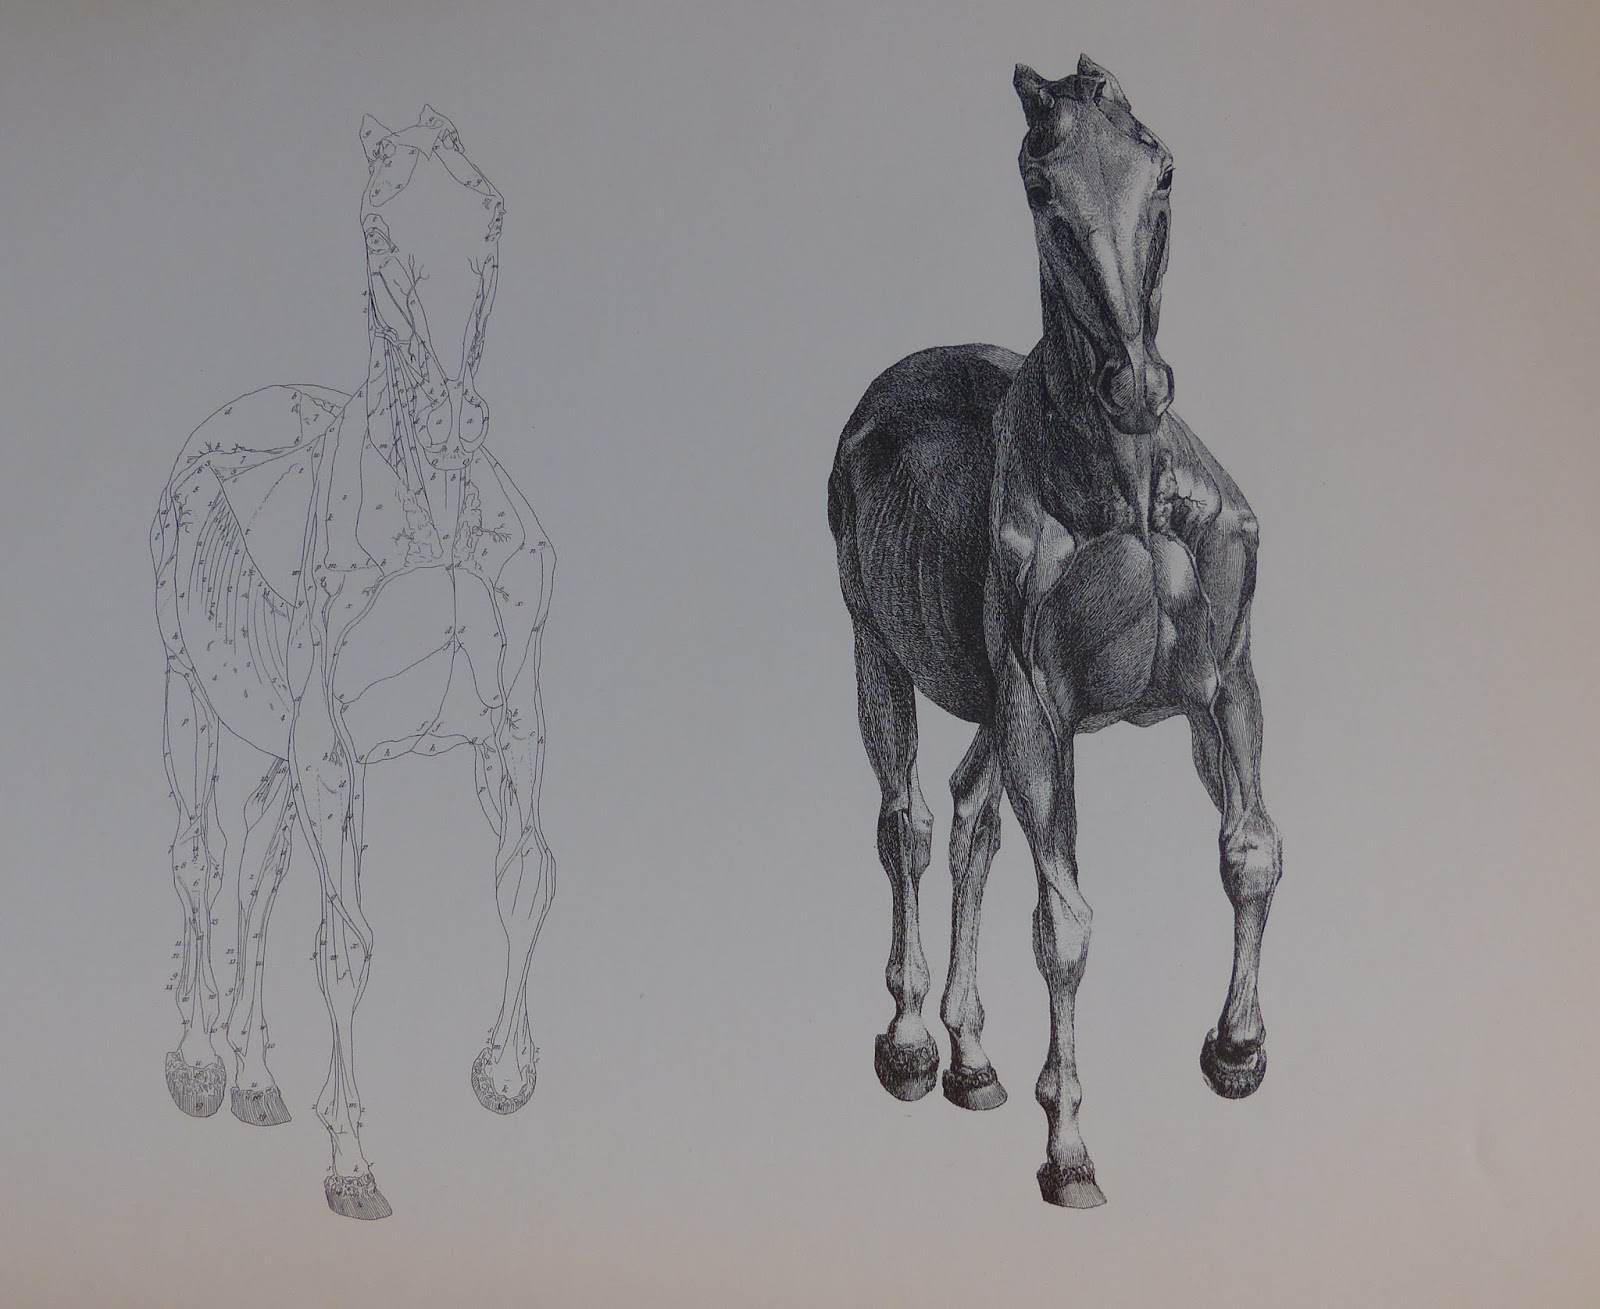 Dariusz caballeros: Stubbs - The Anatomy of the Horse